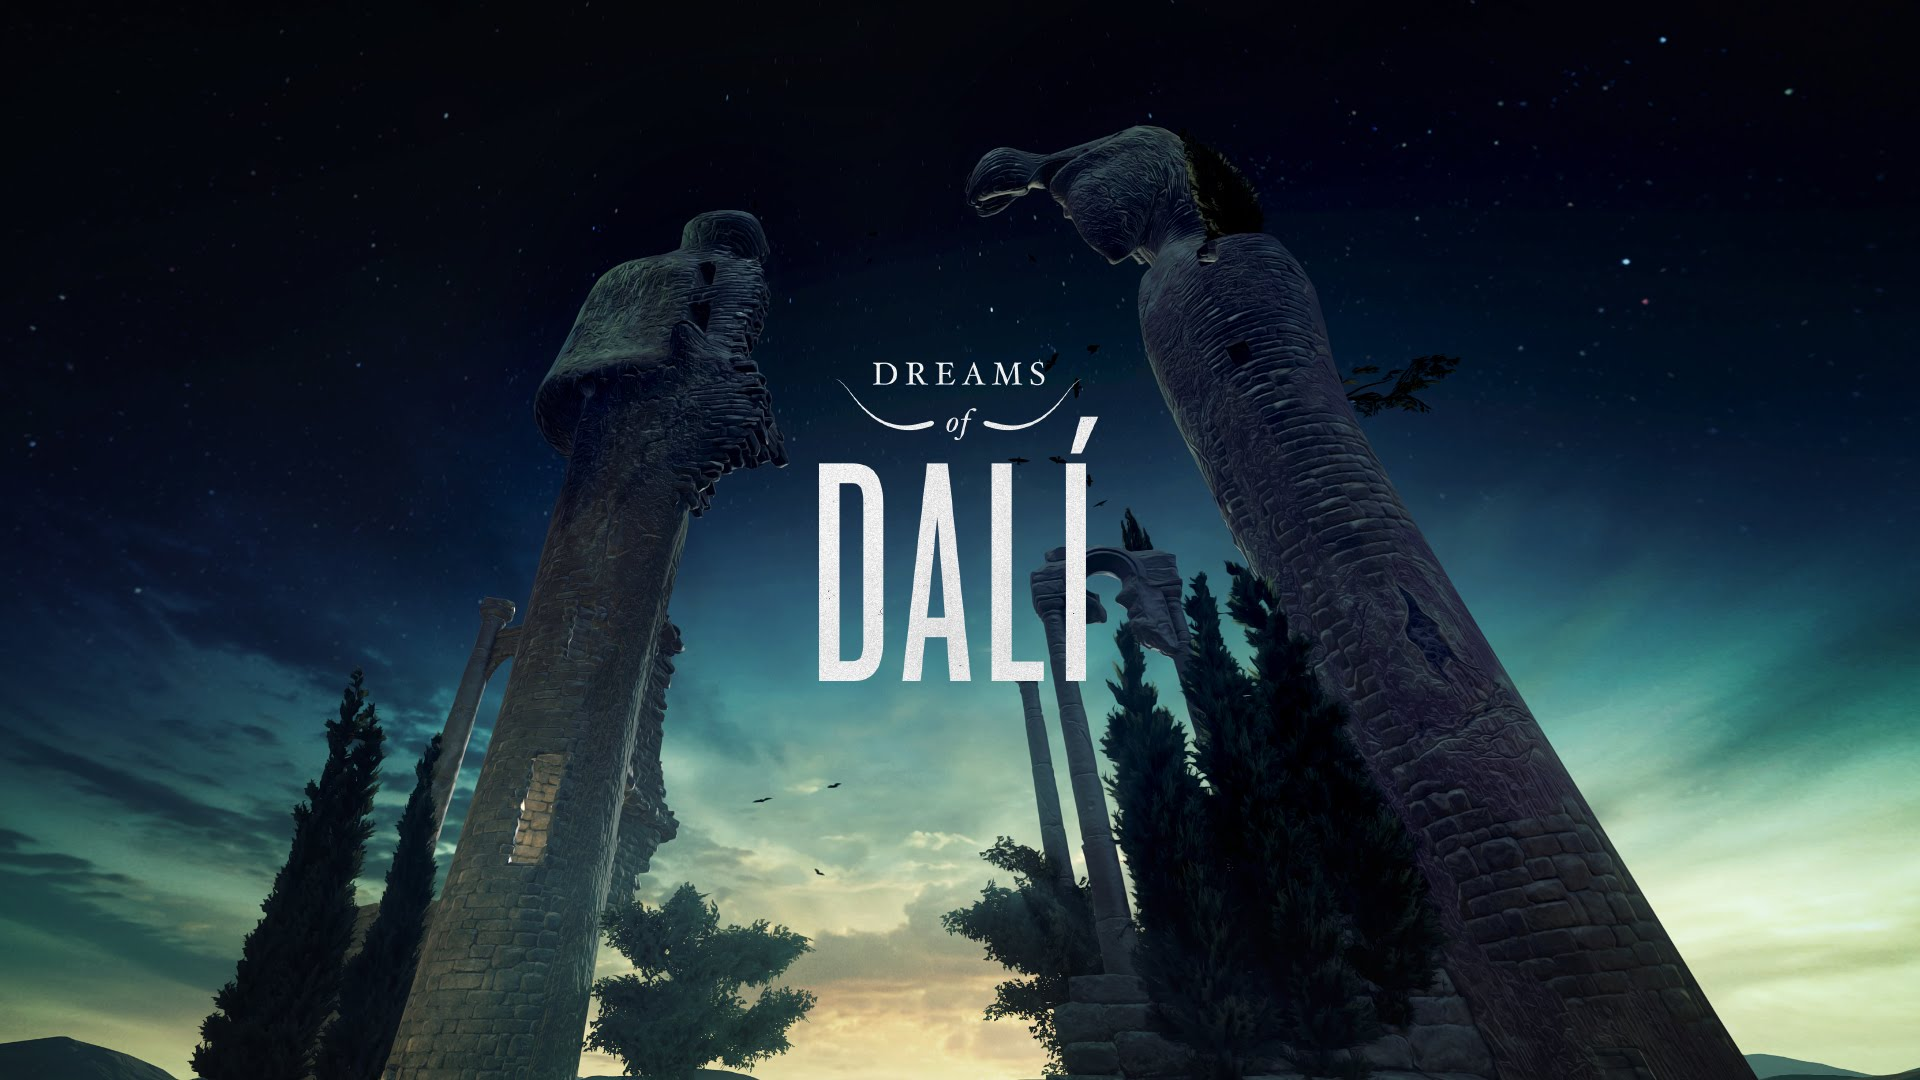 Volar por las pinturas de Dalí